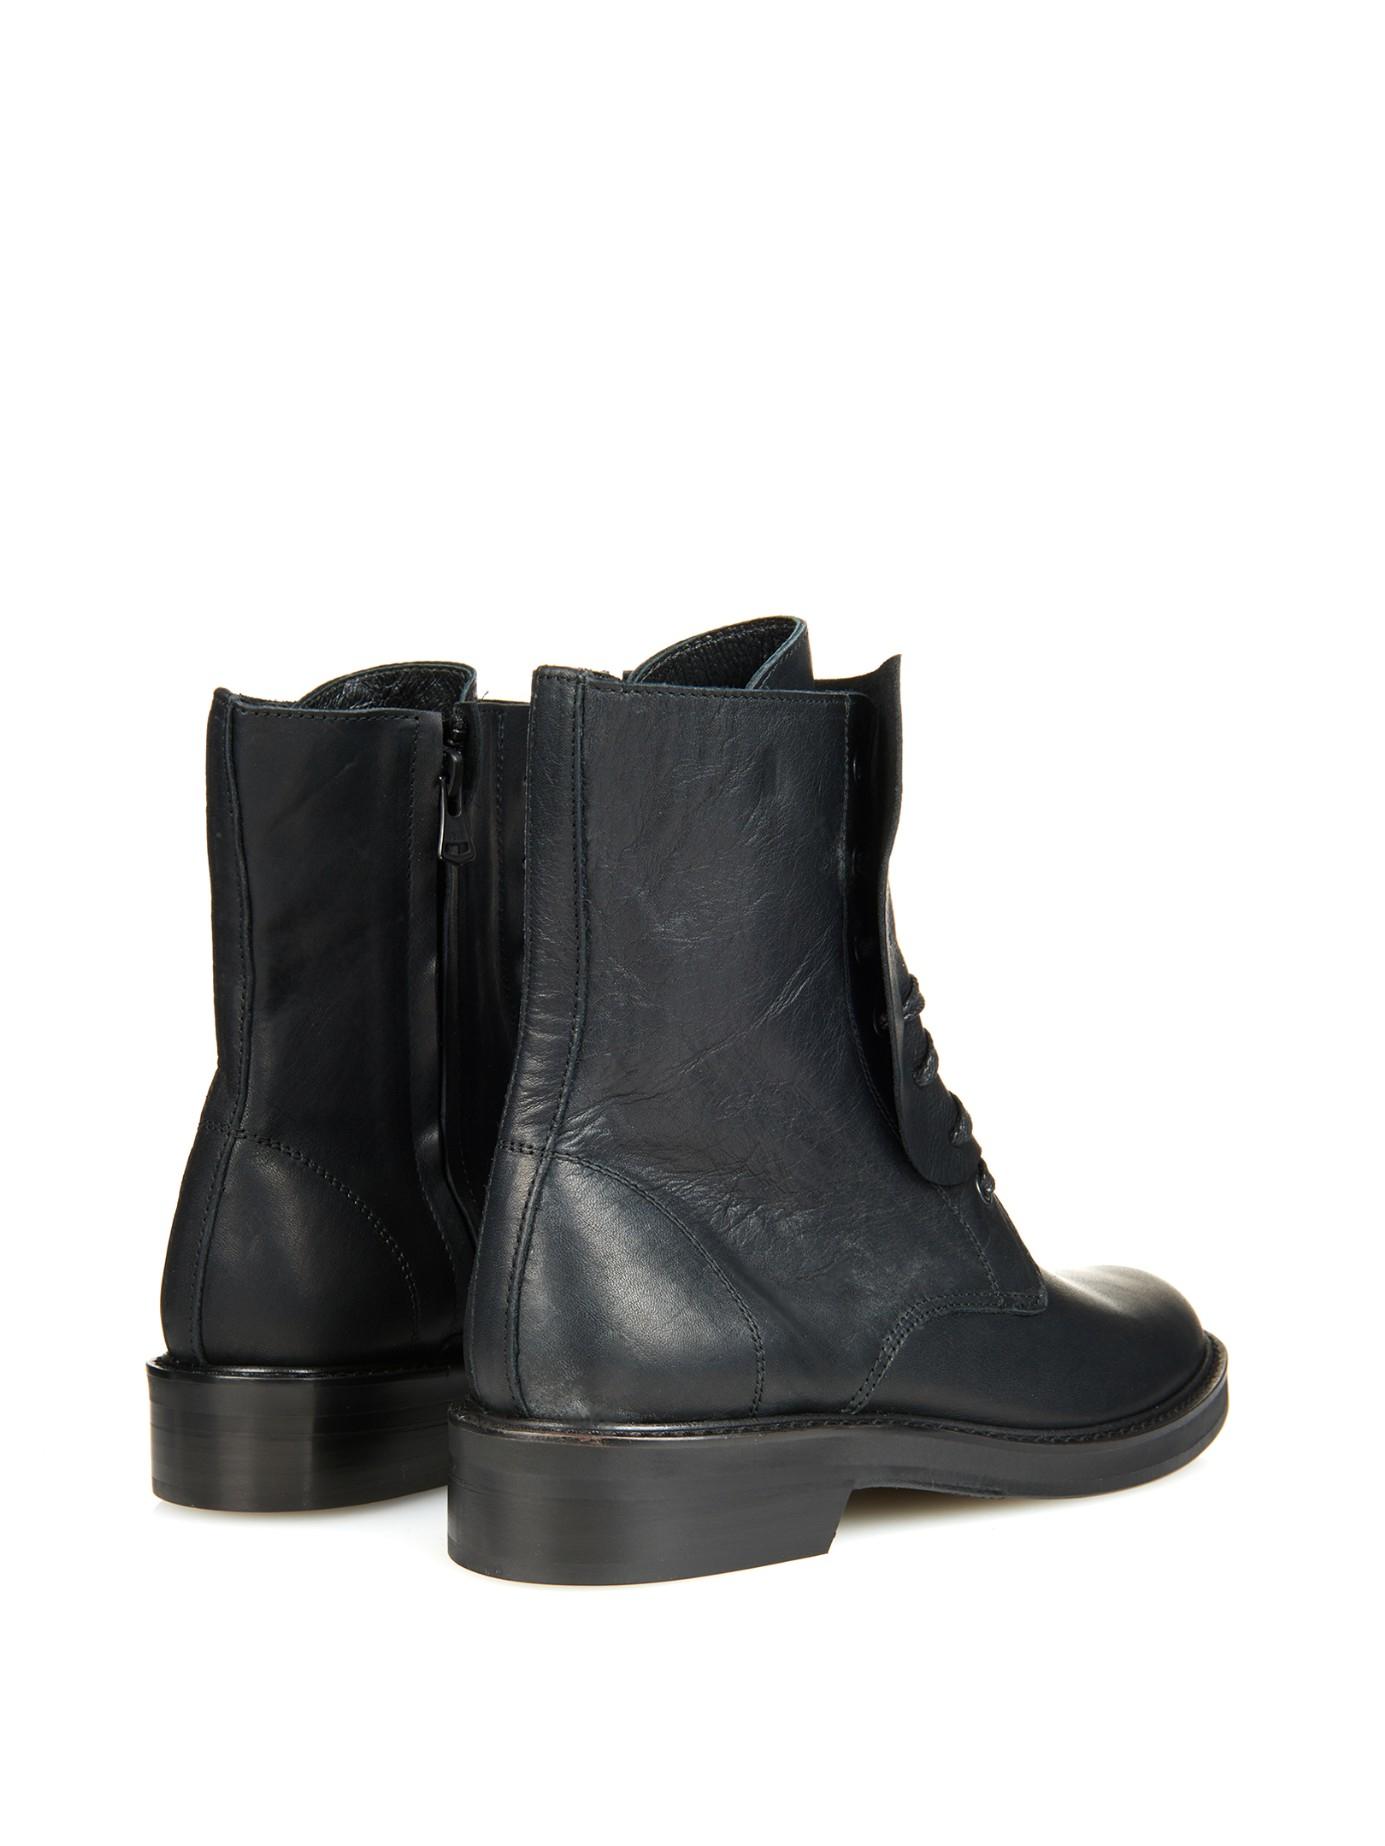 Y's by Yohji Yamamoto Leather Mid-Calf Boots visit sale online buy cheap footlocker finishline sale big sale LgyHE